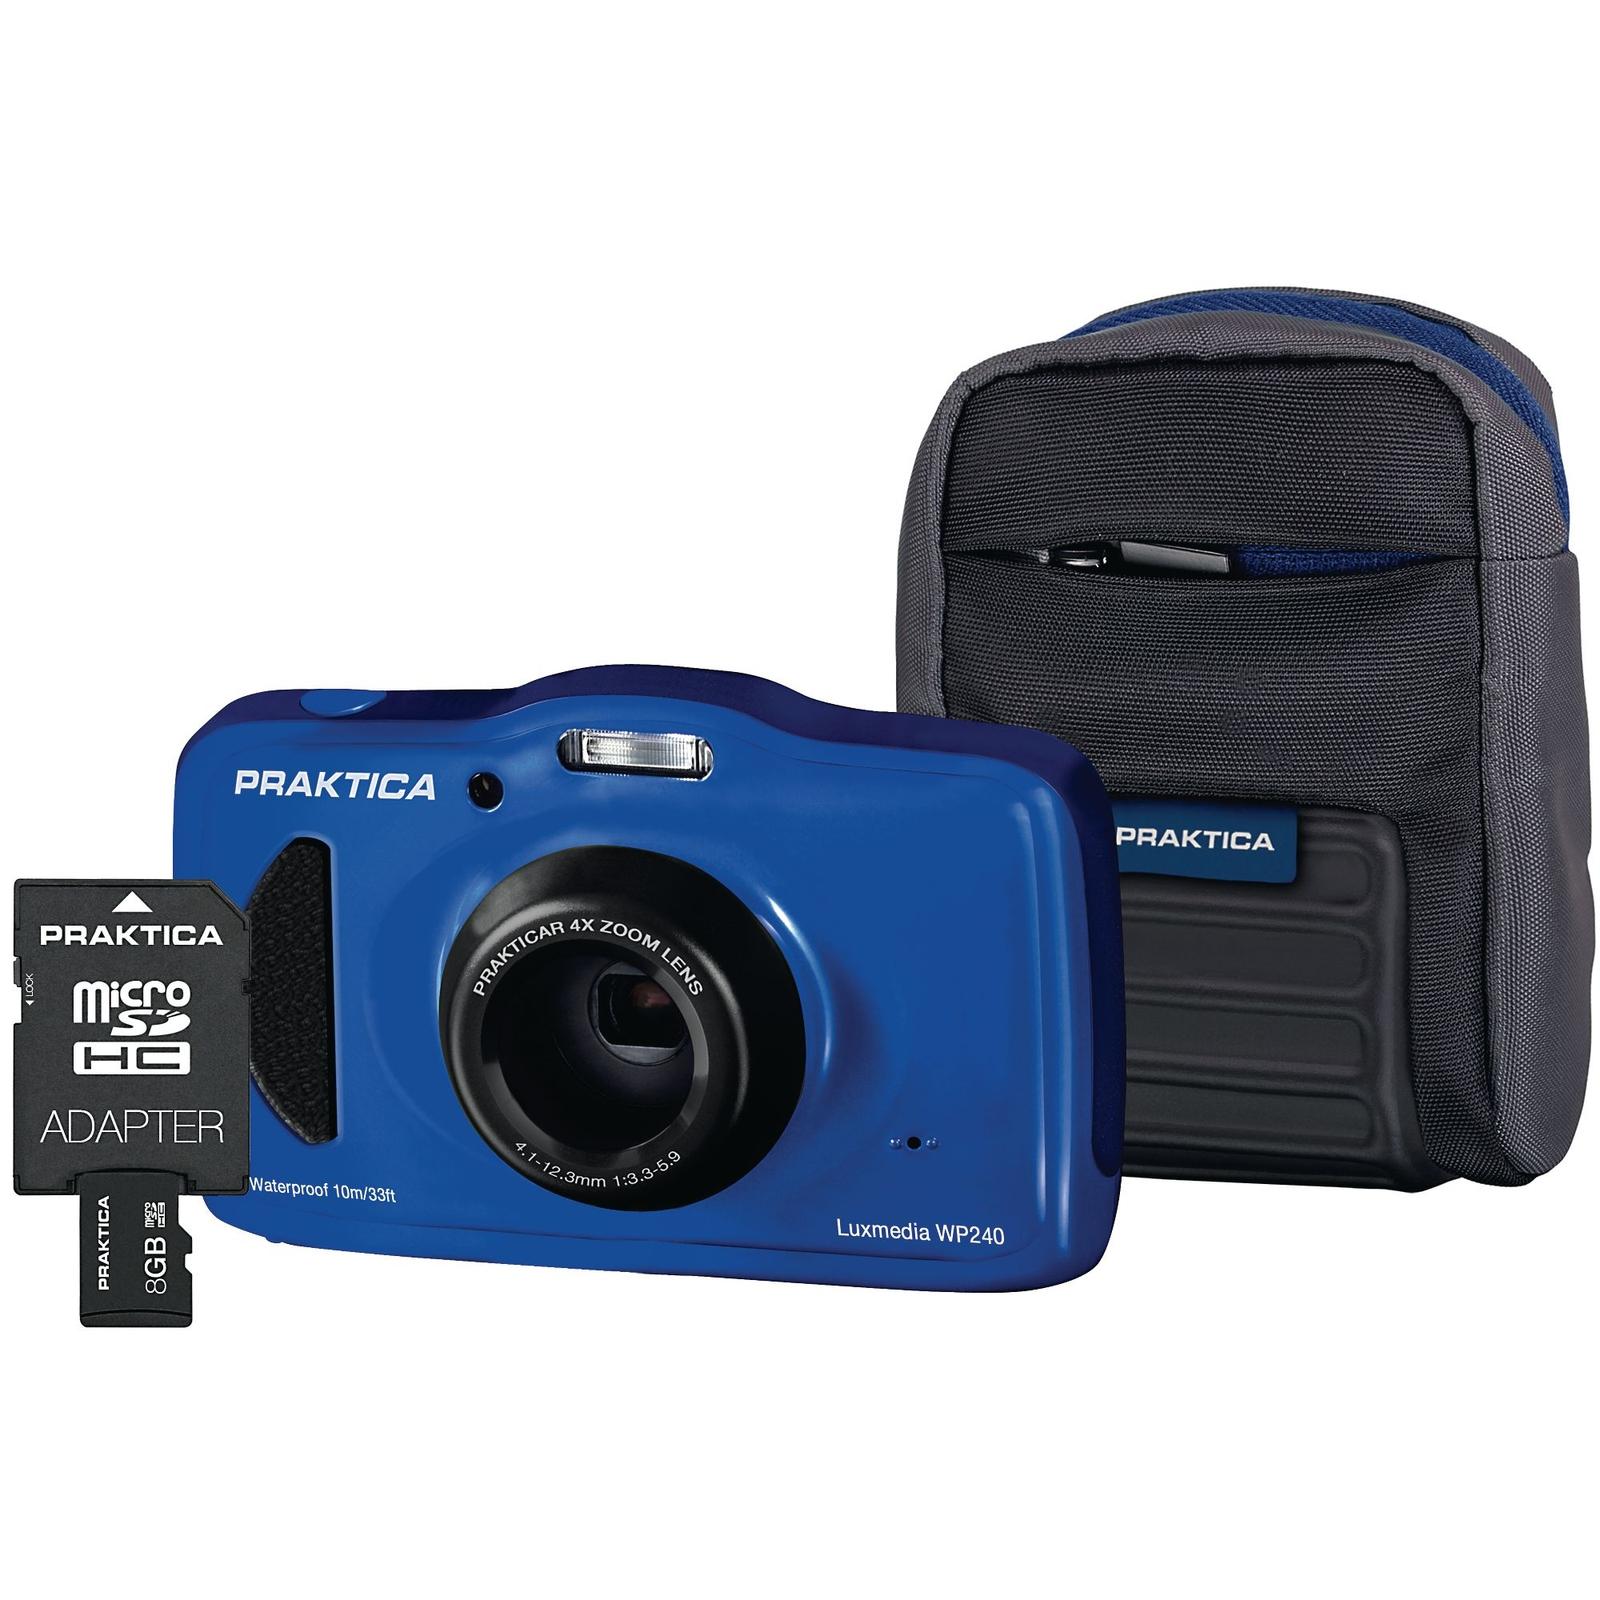 Praktica Luxmedia WP240 Waterproof Camera Kit - Blue